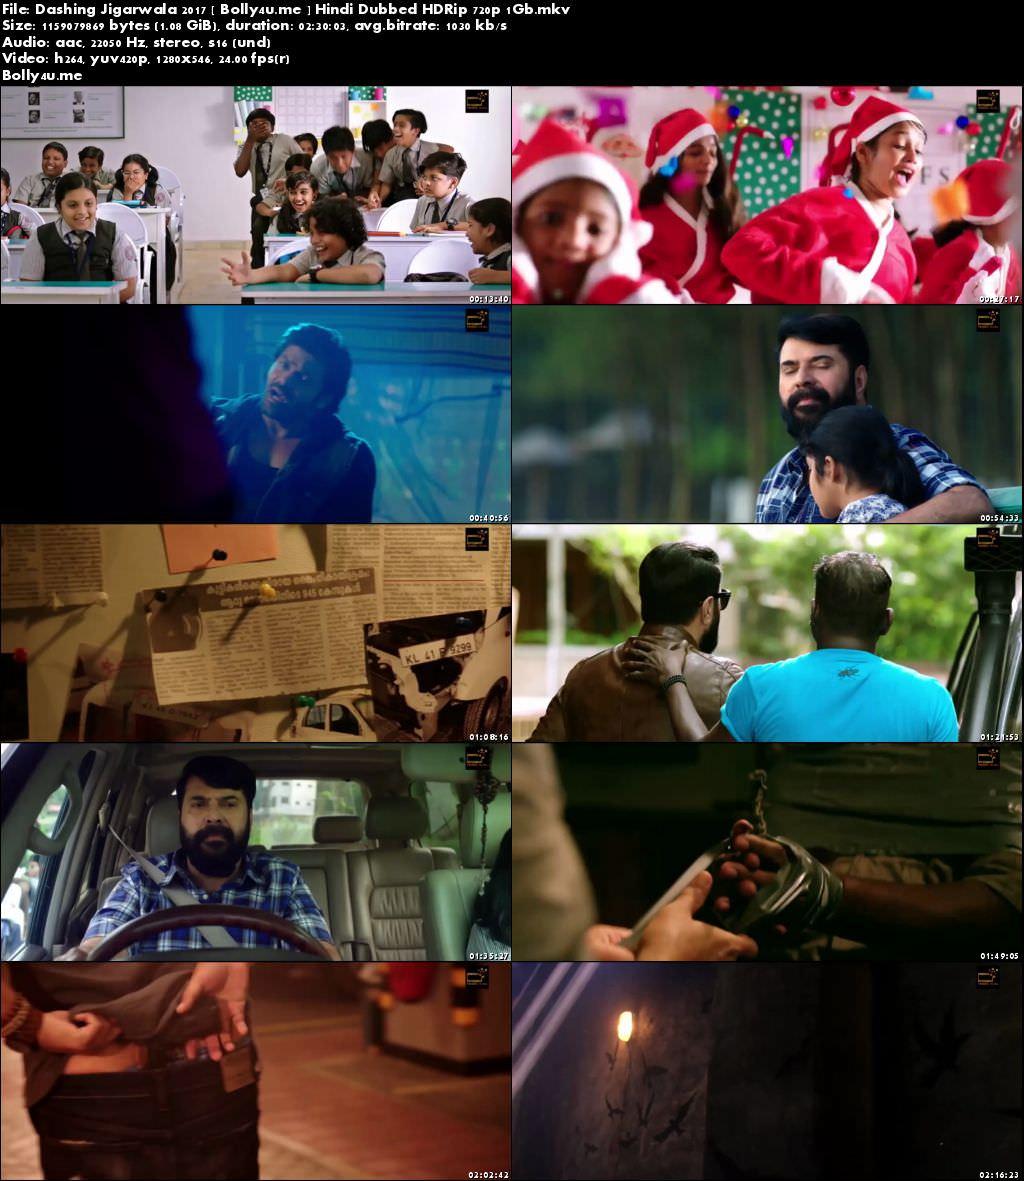 Dashing Jigarwala 2017 HDRip 1GB Hindi Dubbed 720p Download